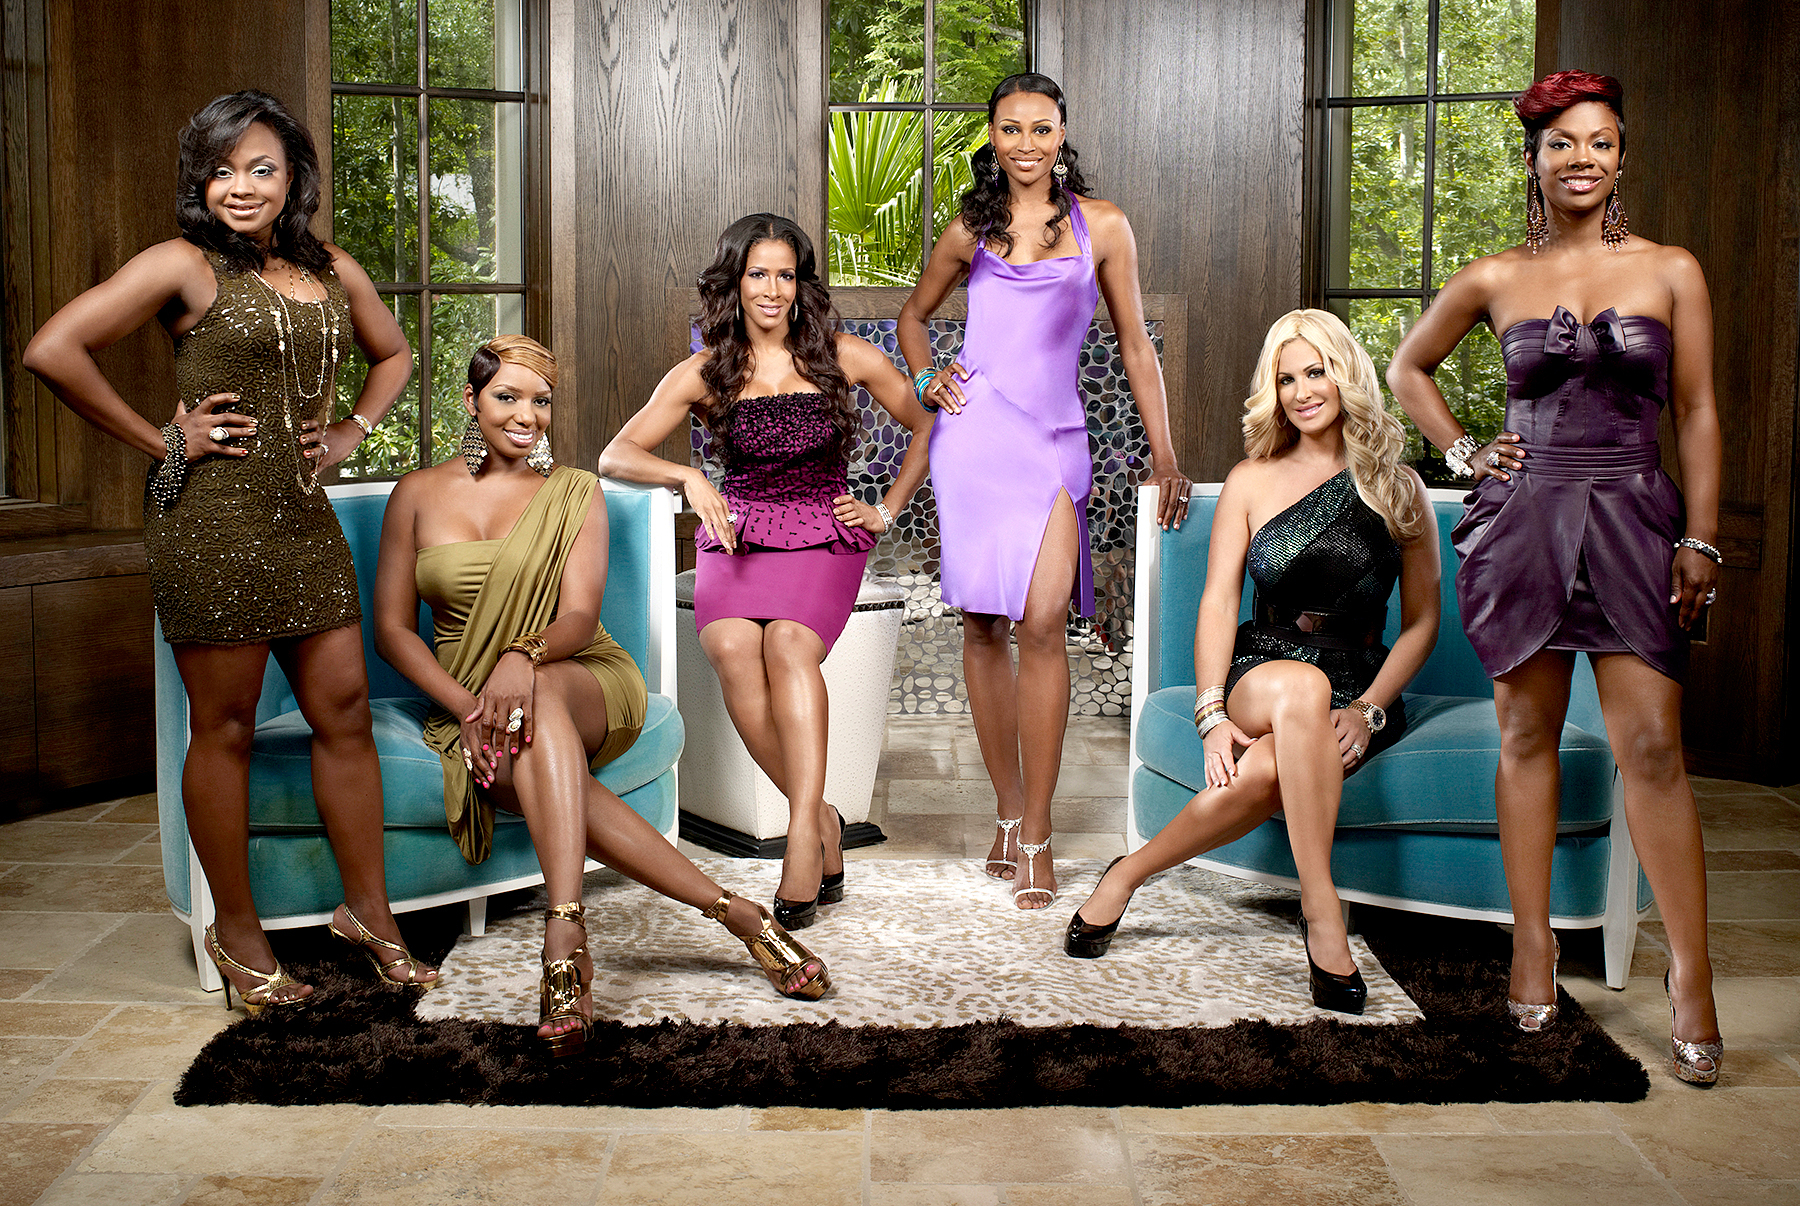 Phaedra Parks, NeNe Leakes, Sheree Whitfield, Cynthia Bailey, Kim Zolciak, Kandi Burruss on season 3 of The Real Housewives of Atlanta.